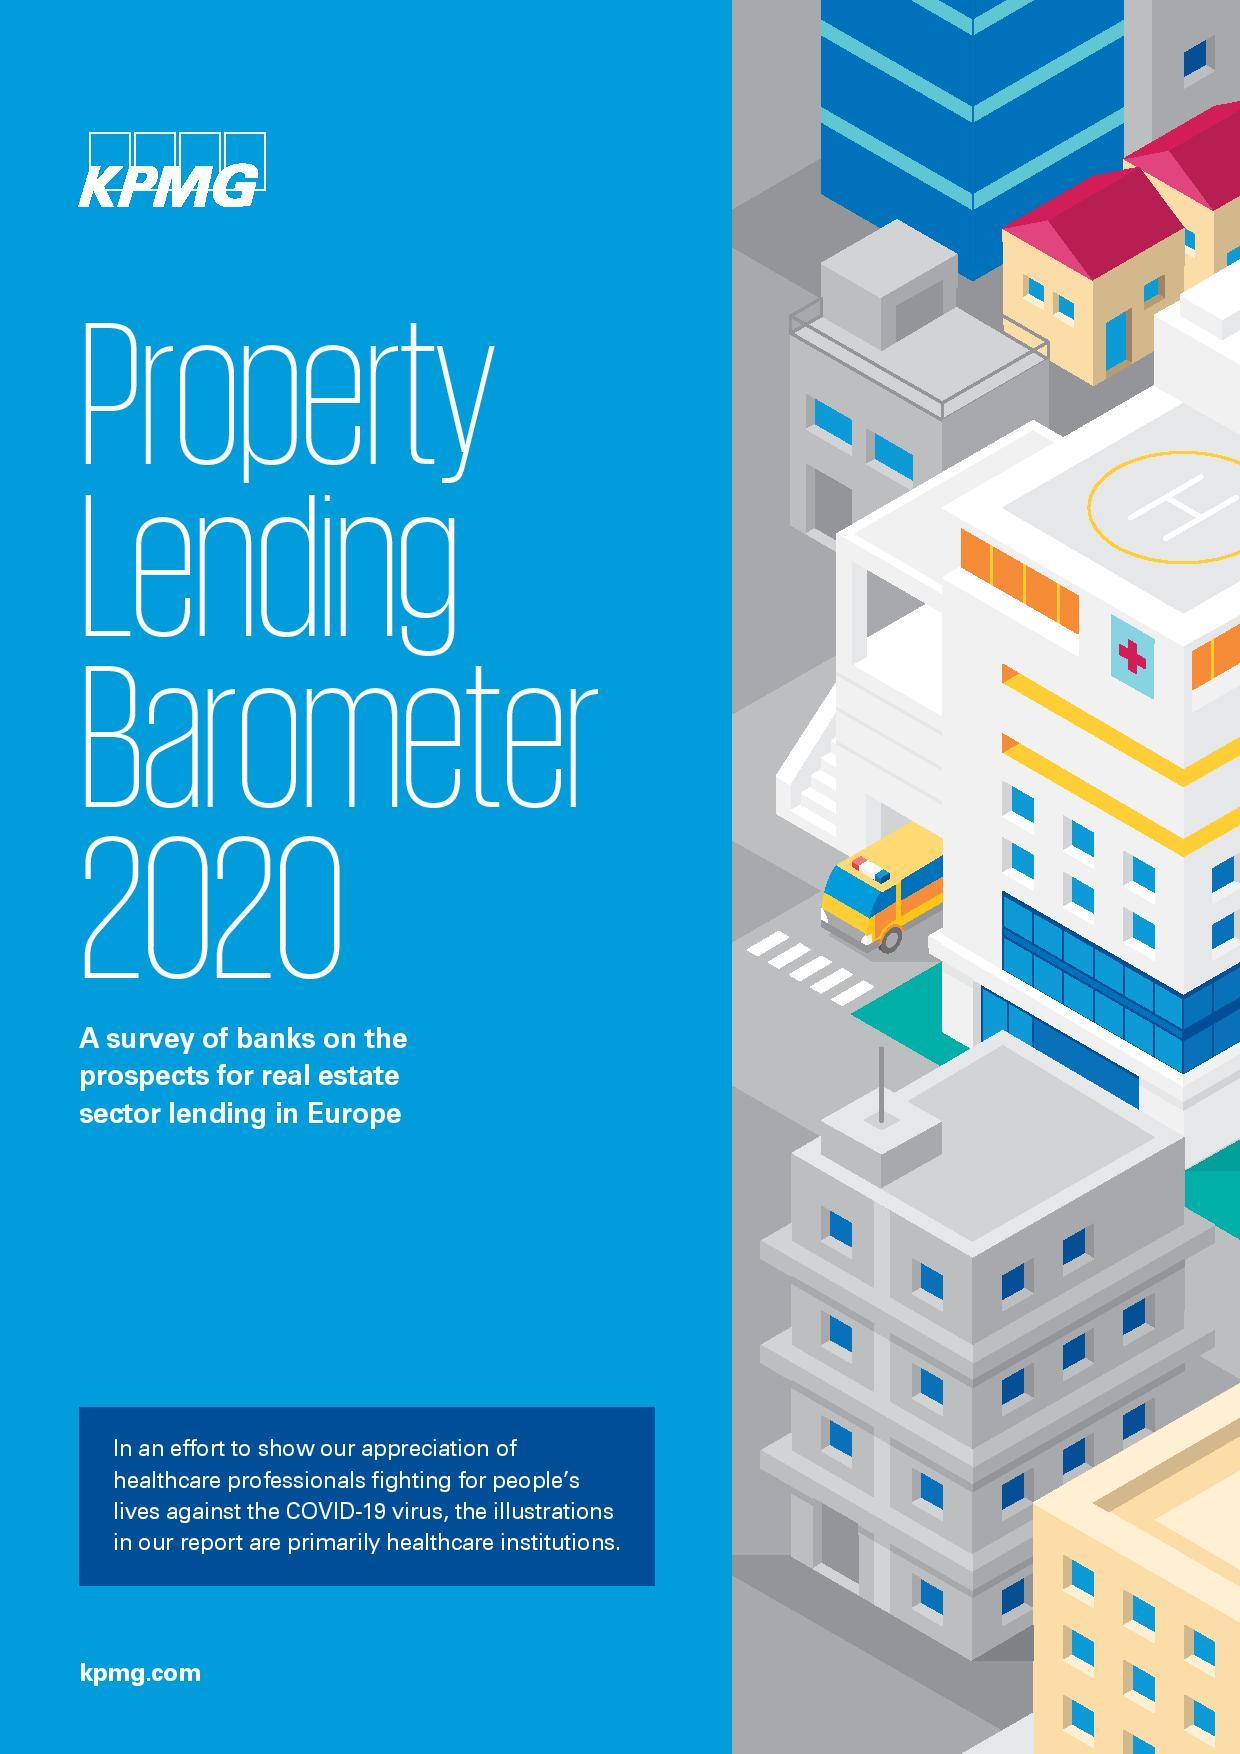 KPMG Cyprus: Property Lending Barometer 2020